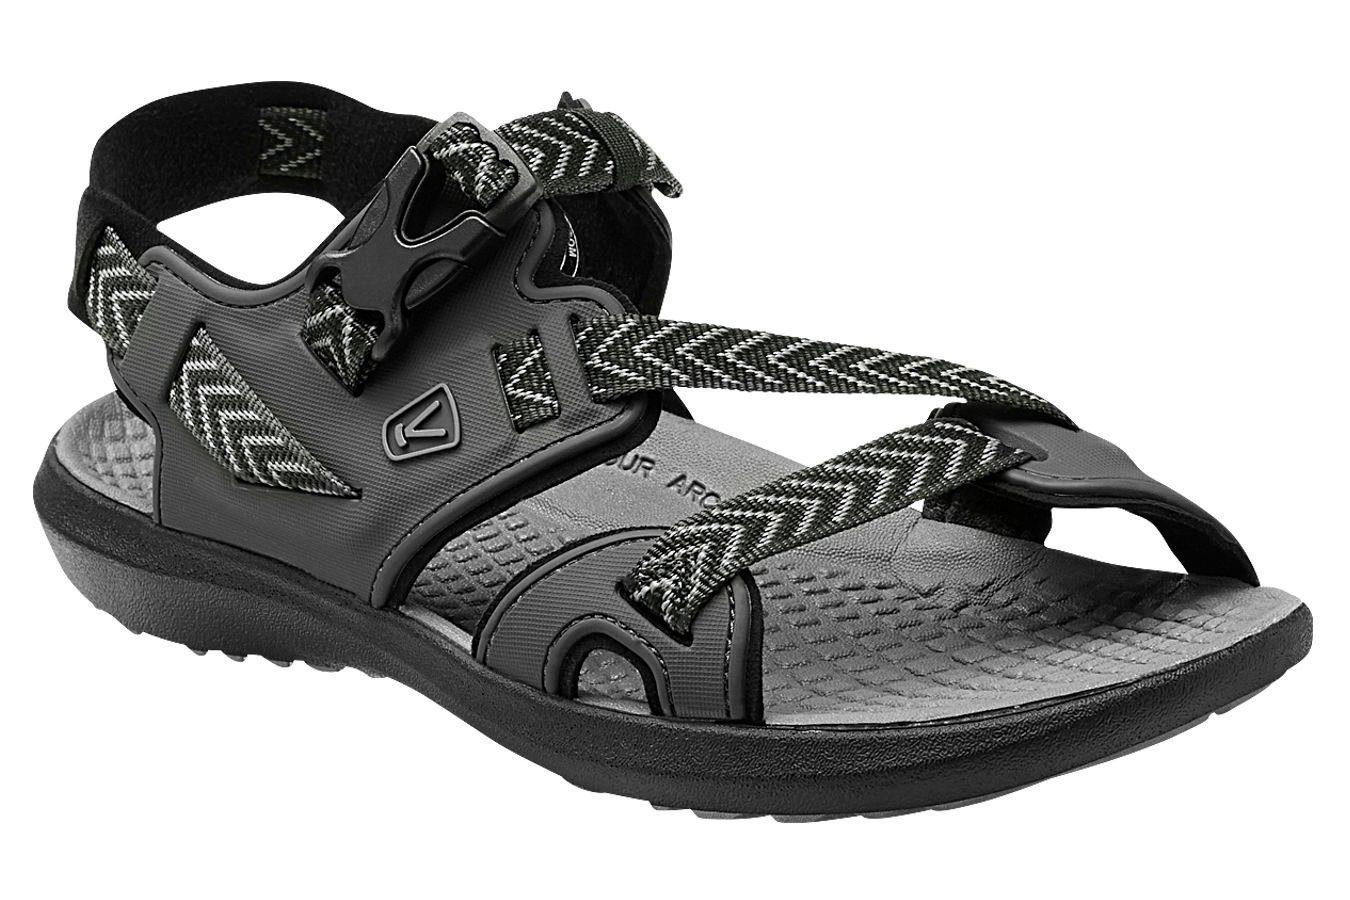 Keen Sandale Maupin Sandals Men online kaufen  schwarz